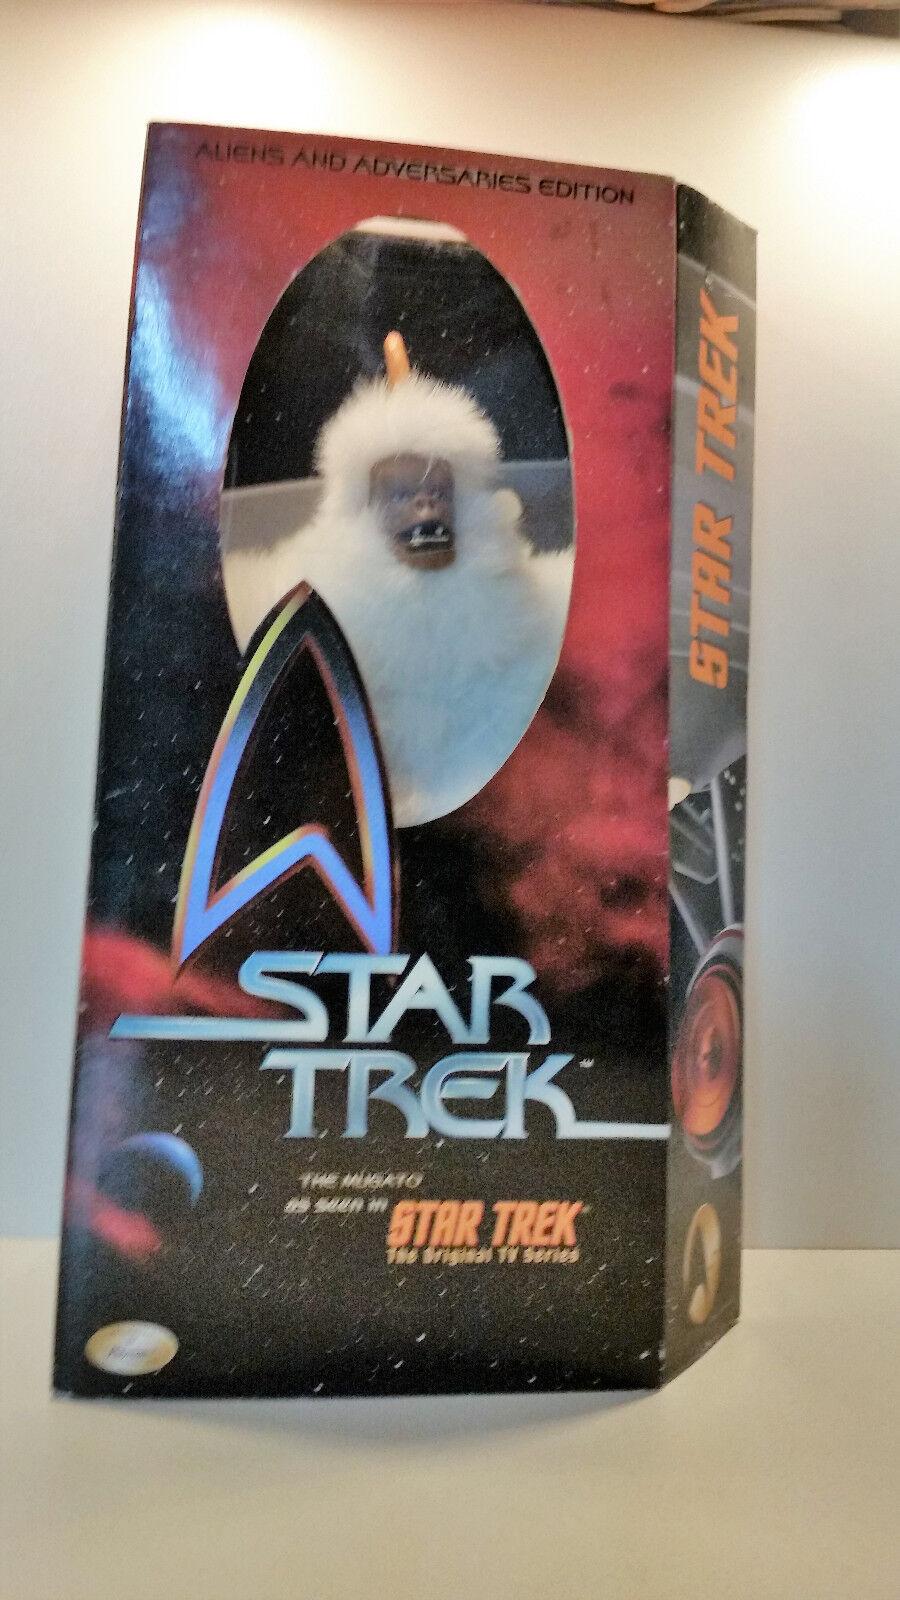 Star Trek 1999 Playmates 12 inch / 30 cm Original TV Series Mugato MIB